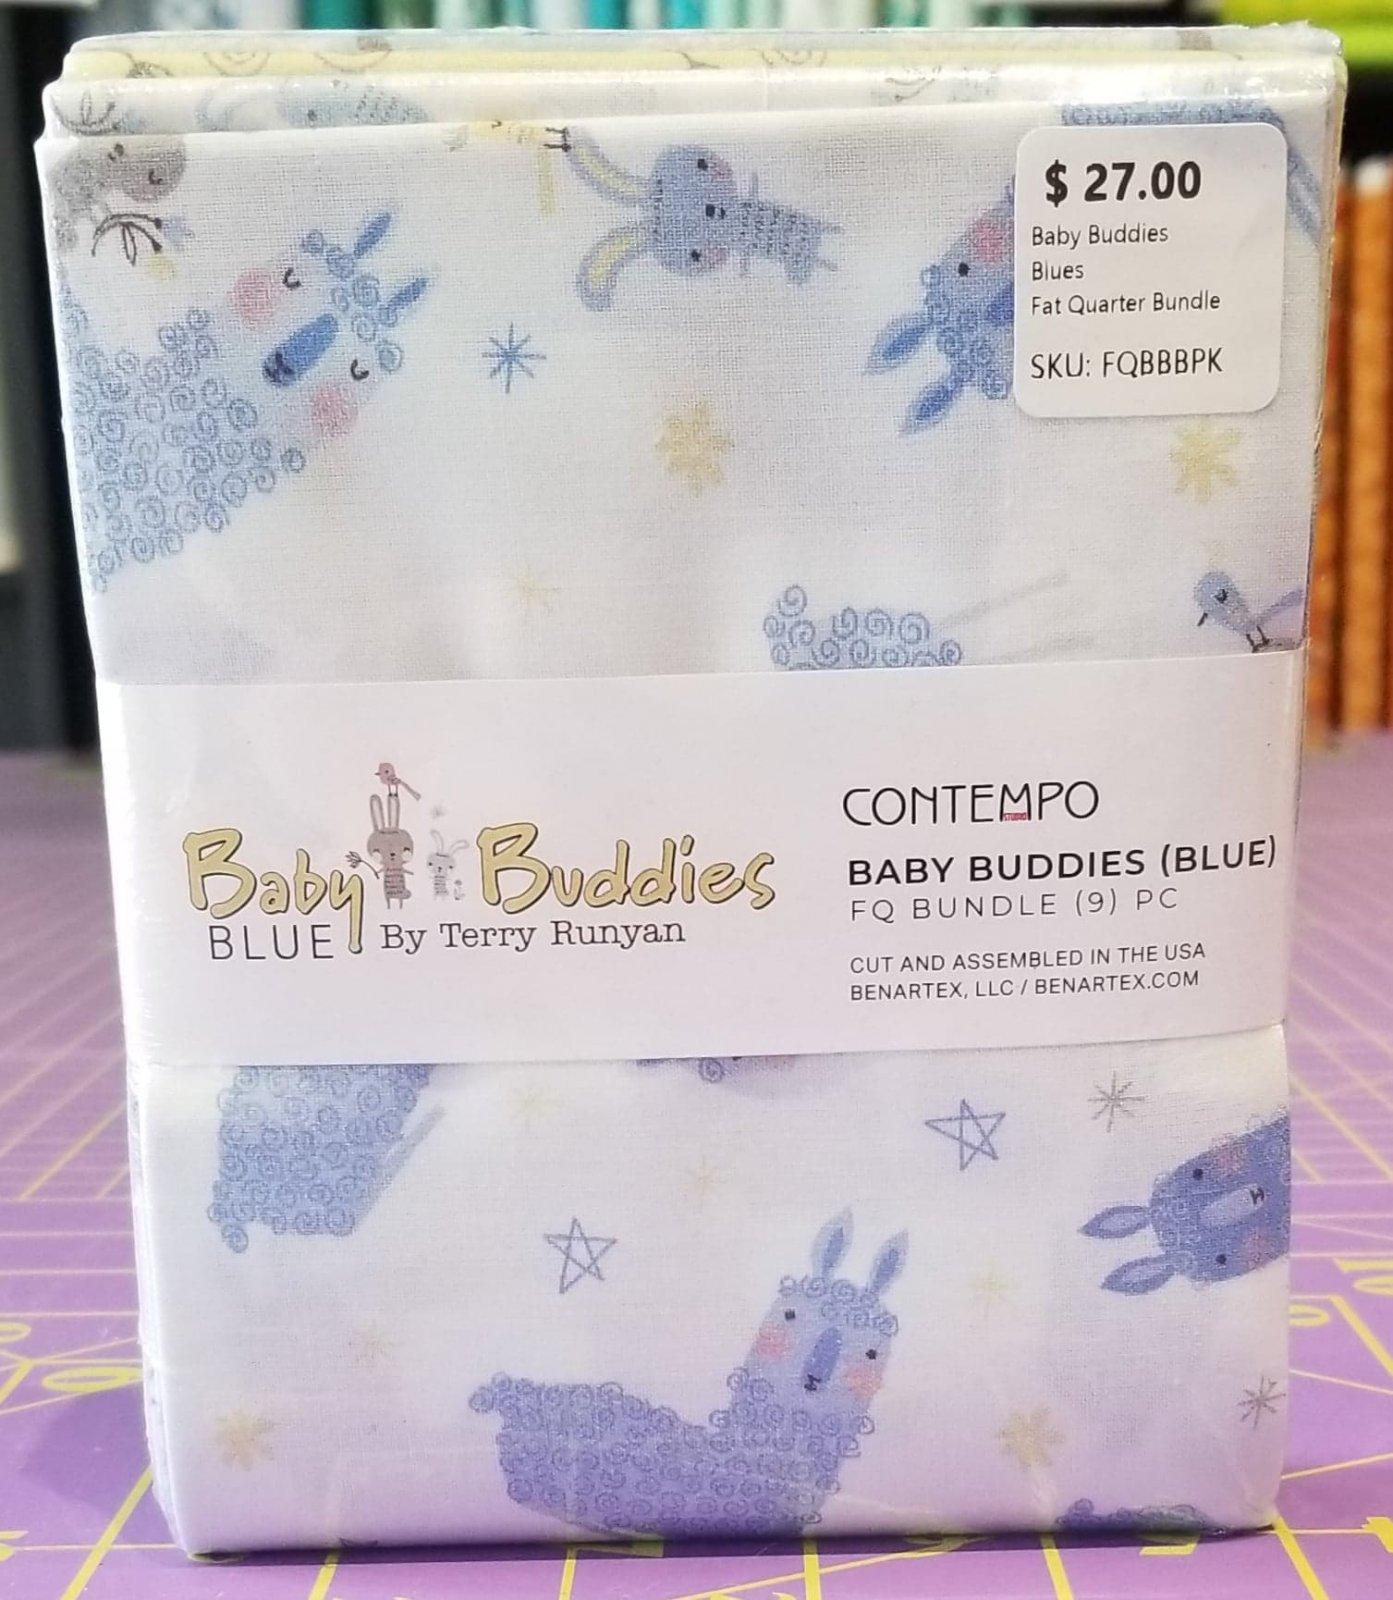 Baby Buddies Blues Fat Quarters 9pcs